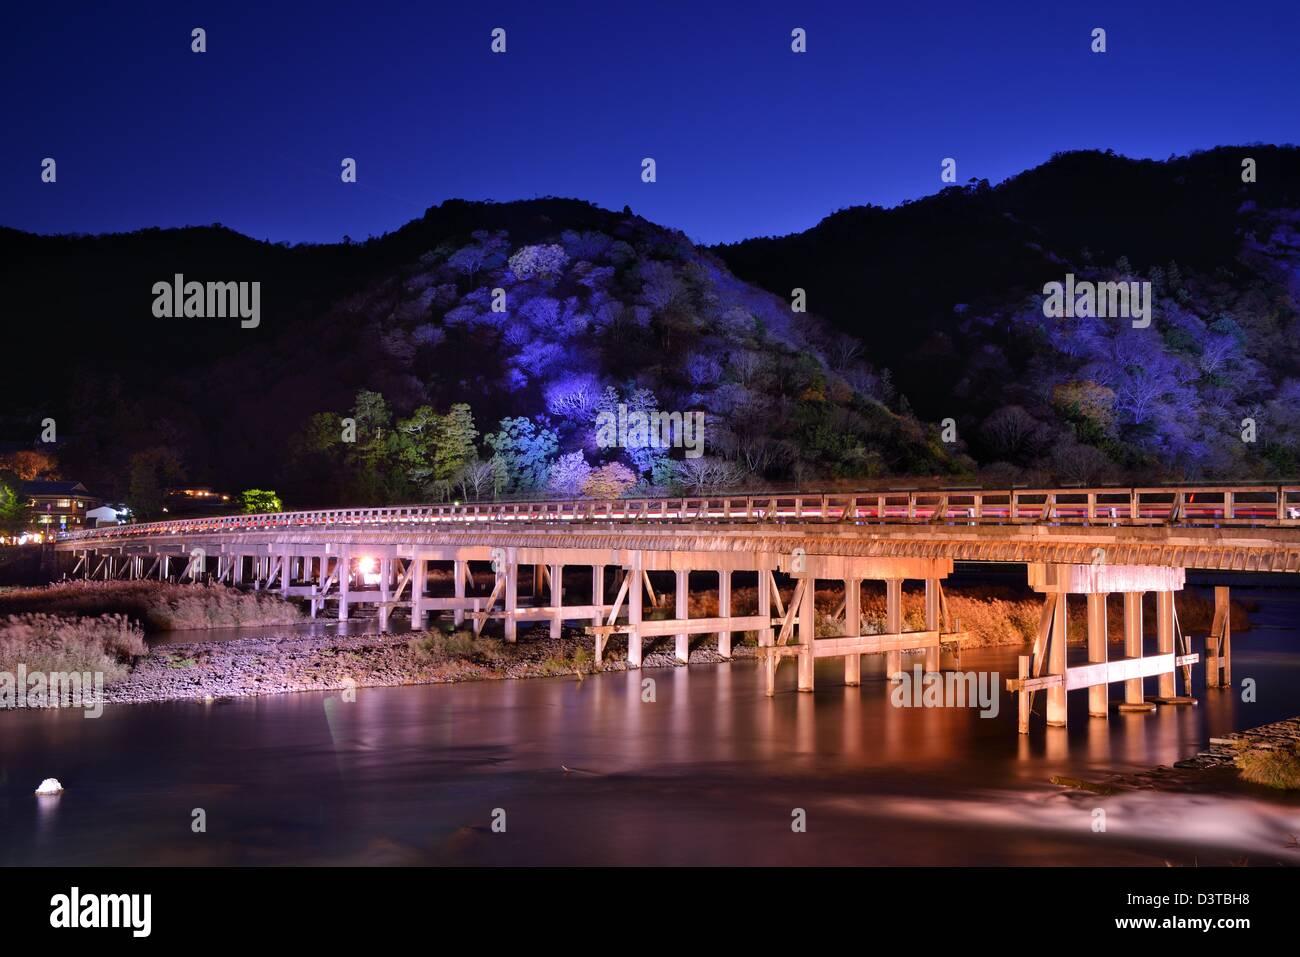 The historic Togetsukyo Bridge, illuminated at night in the Arashiyama district of Kyoto, Japan. - Stock Image